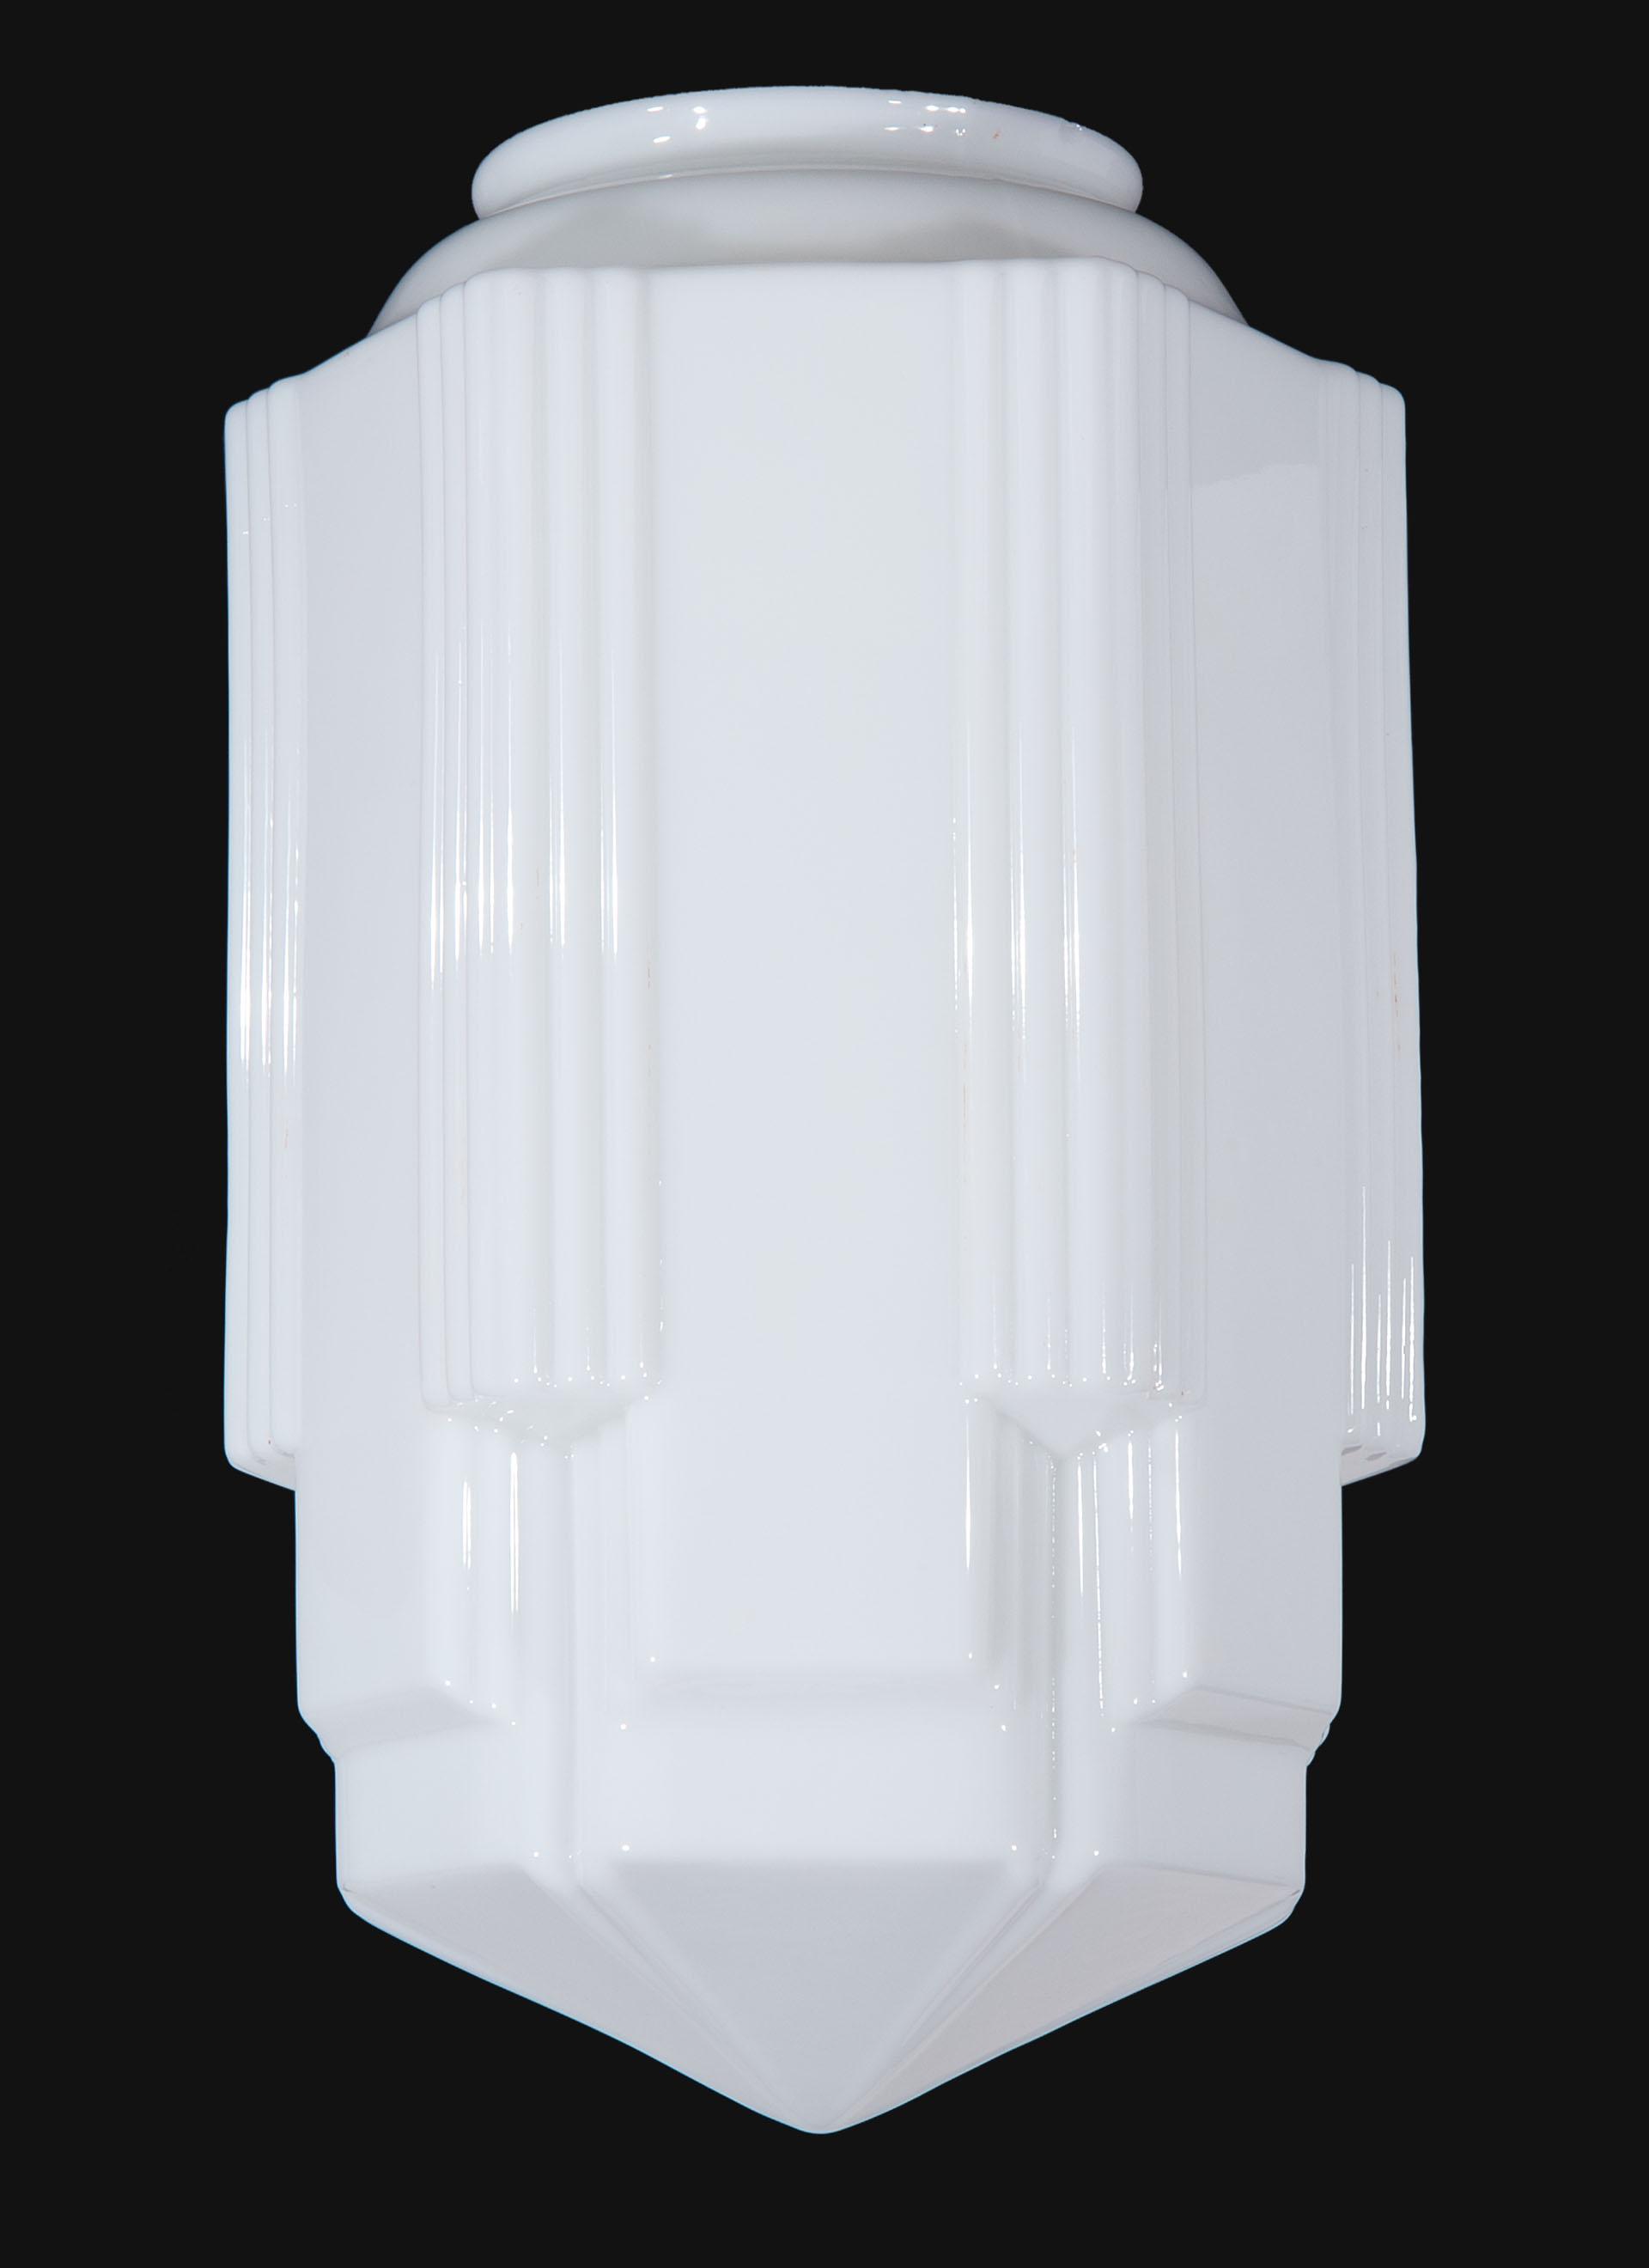 16 12 Tall Opal Glass Art Deco Pendant 08813  BP Lamp Supply